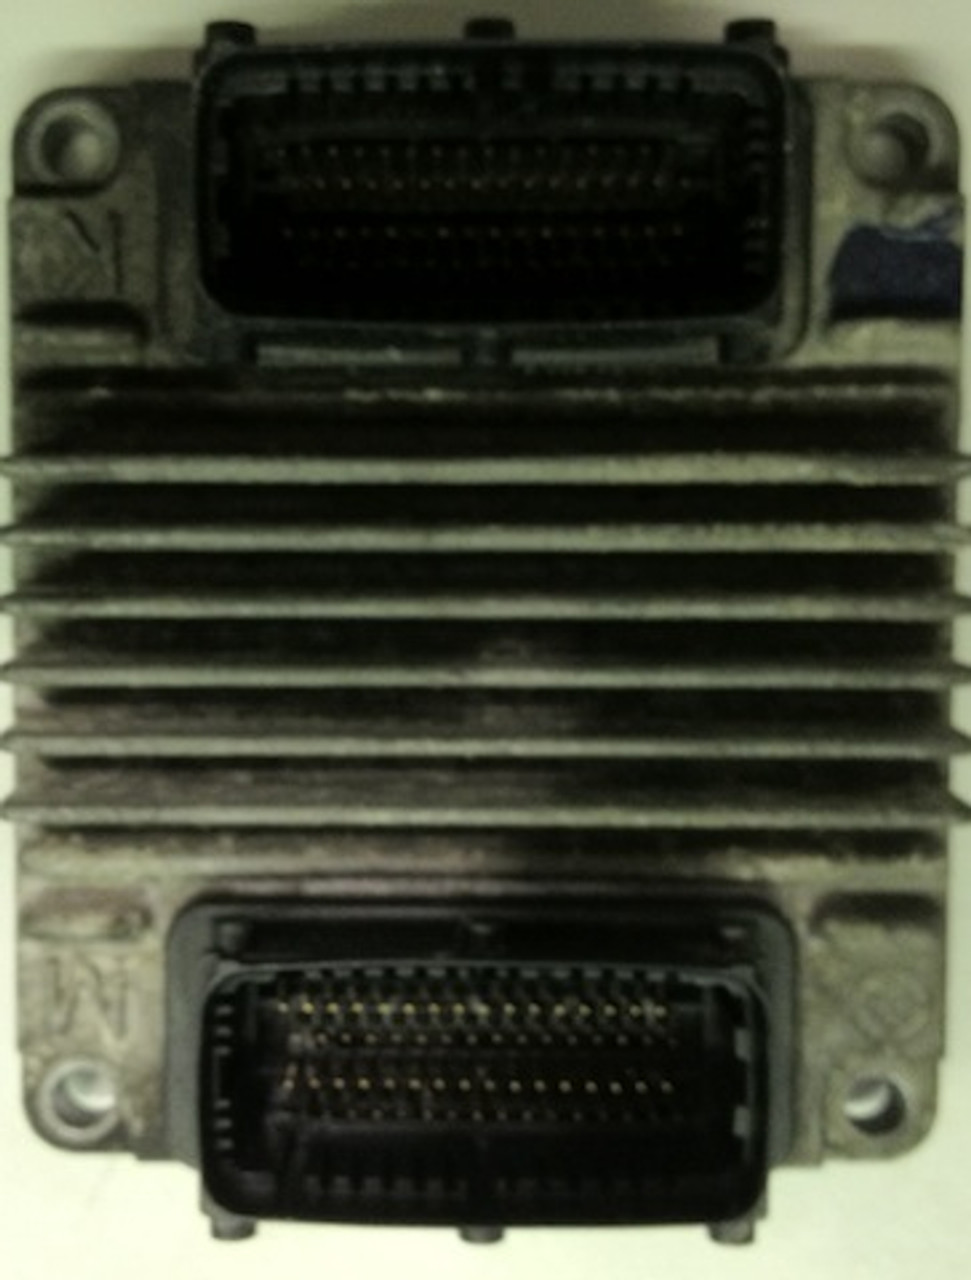 Reset Delphi Engine ECU, Vauxhall/Opel Diesel, ECM 1.7L/TX2 1.7 DTI  09391269 8972406220